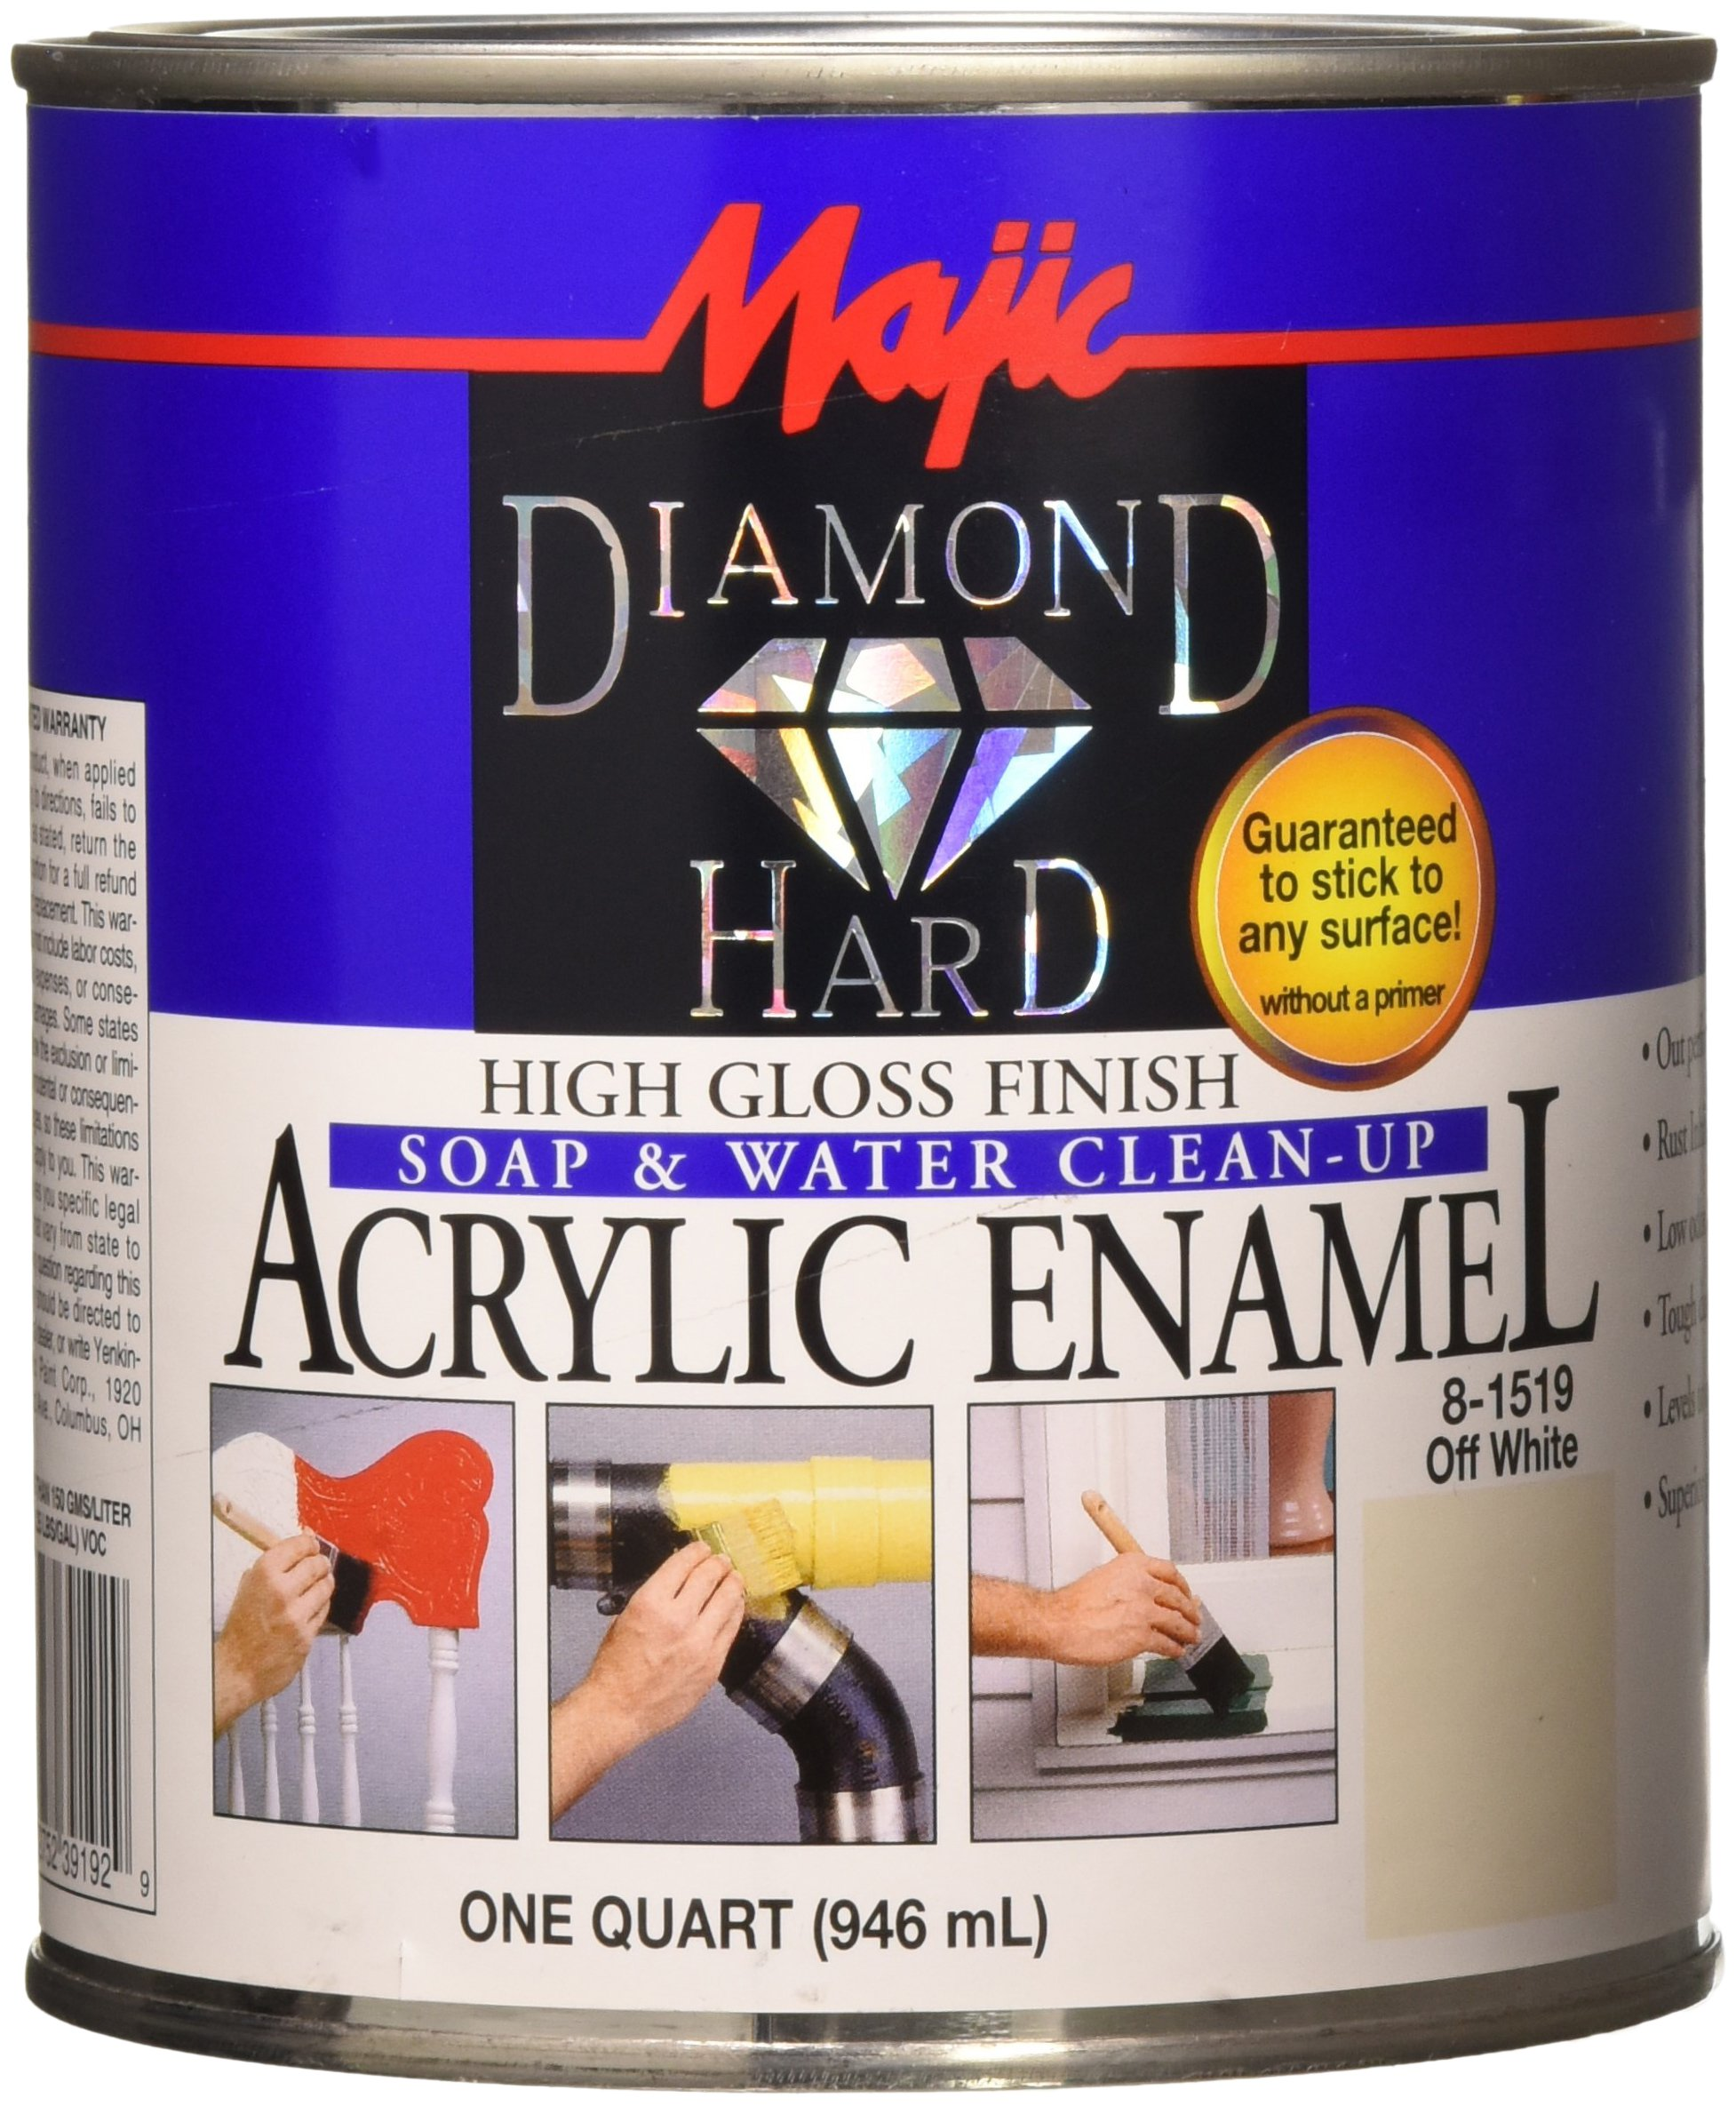 Majic Paints 8-1519-2 Diamond Hard Acrylic Enamel High Gloss Paint, 1- Quart, Off White